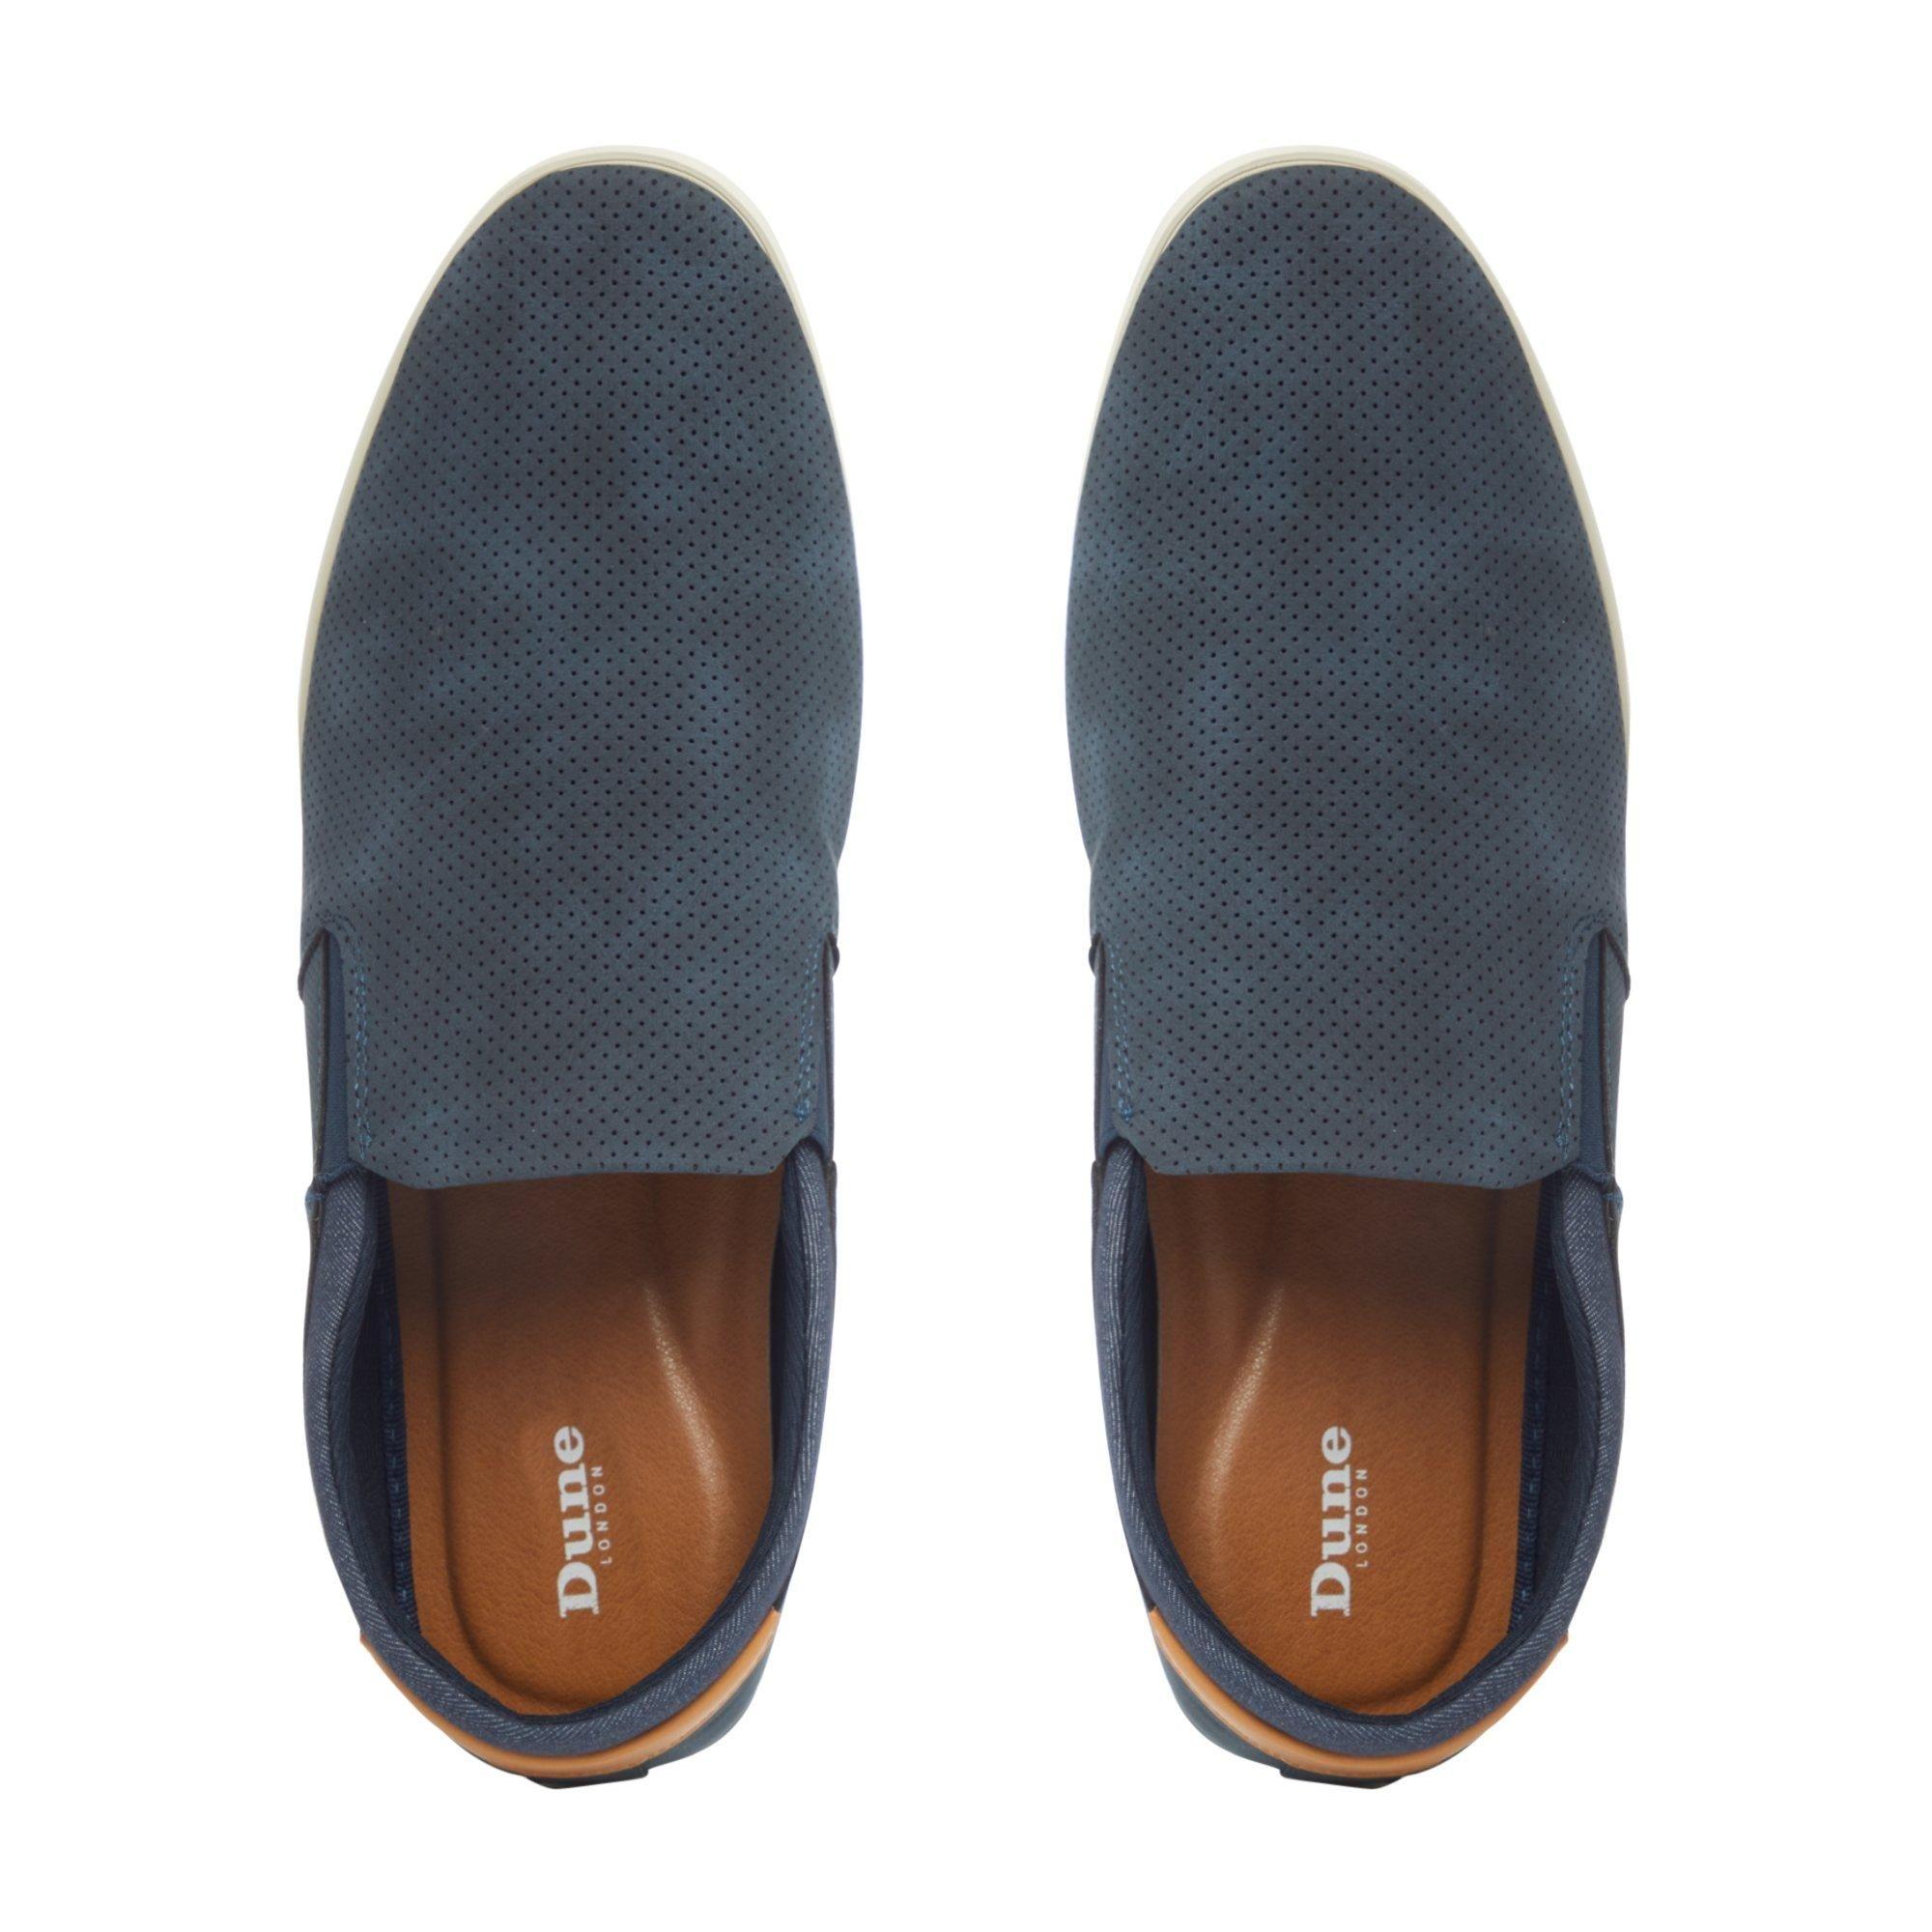 Dune Mens BLINKS Perforated Slip On Shoes